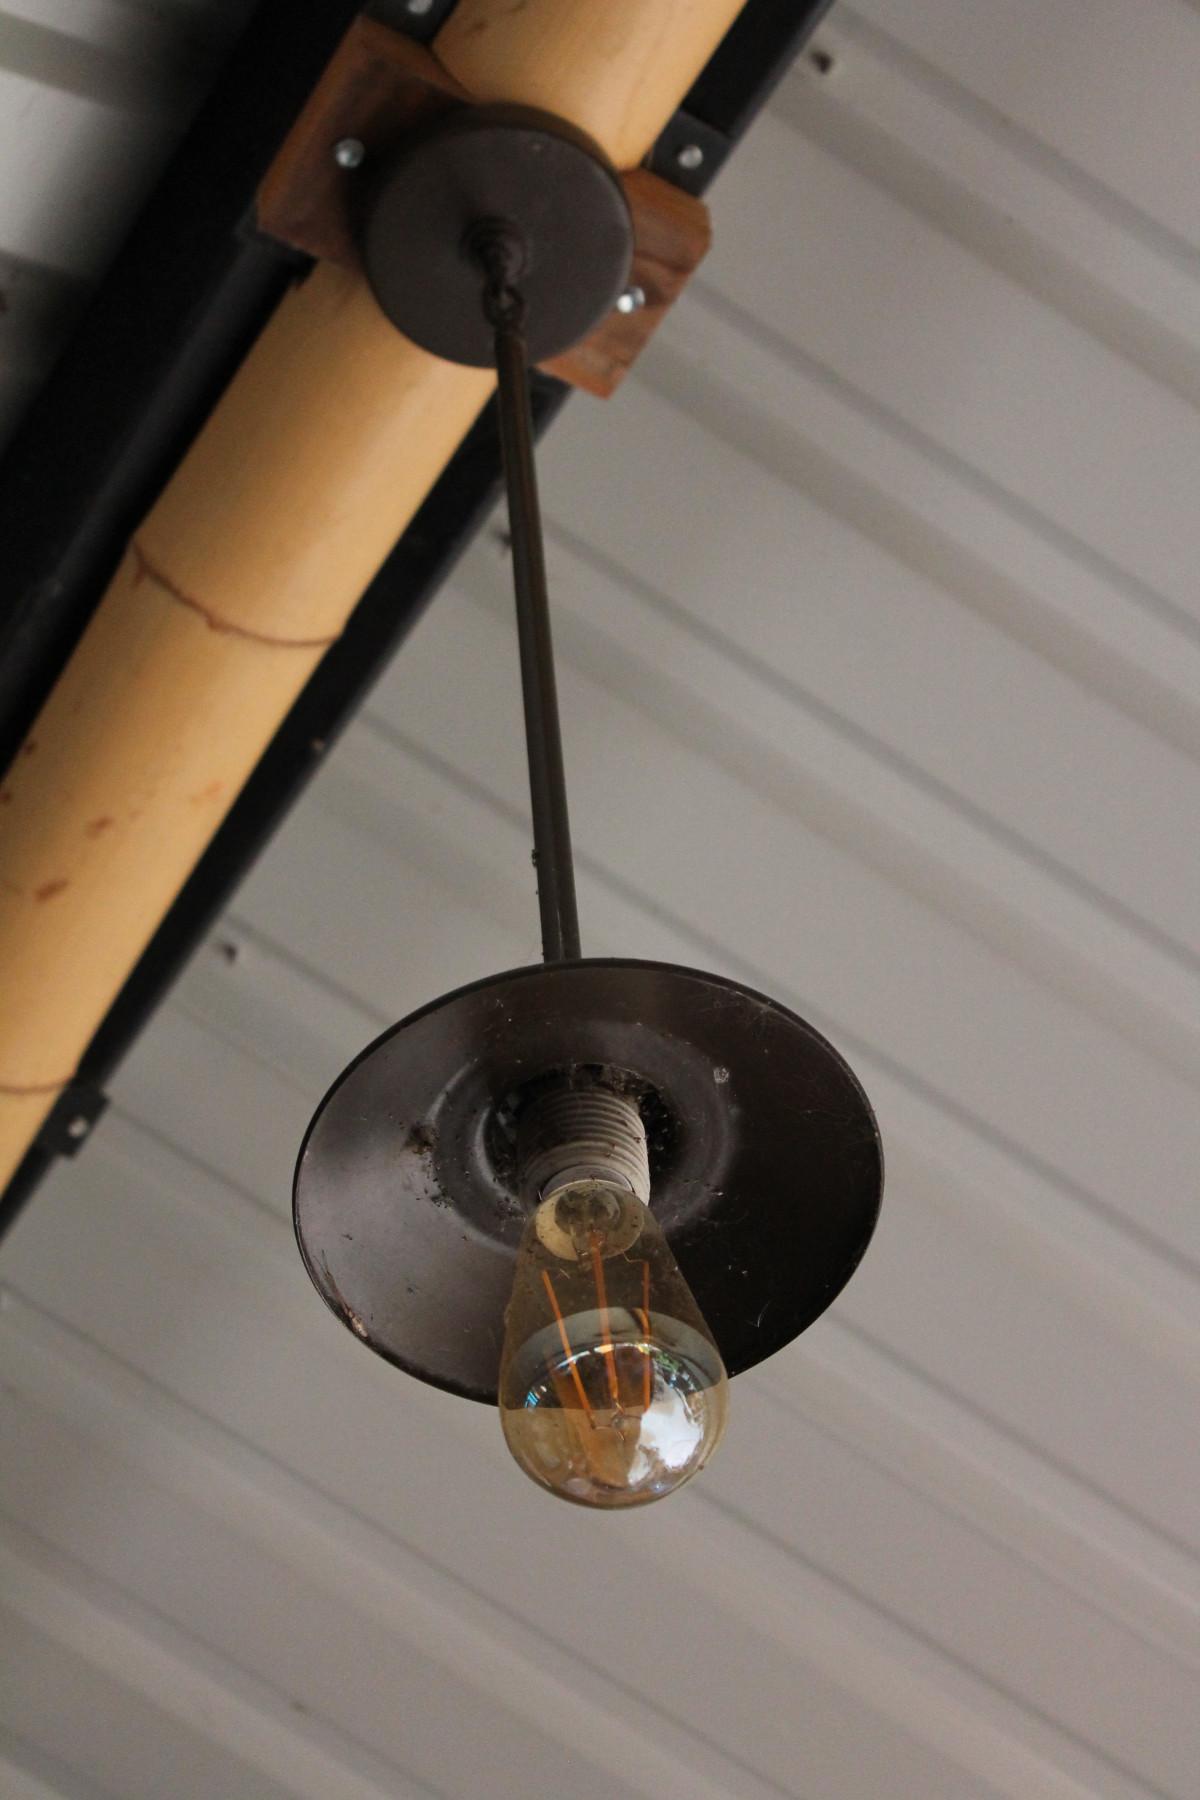 Free Images Glow Light Bulb Product Fixture Metal Art Lights Background Vintage Mechanical Fan Ceiling